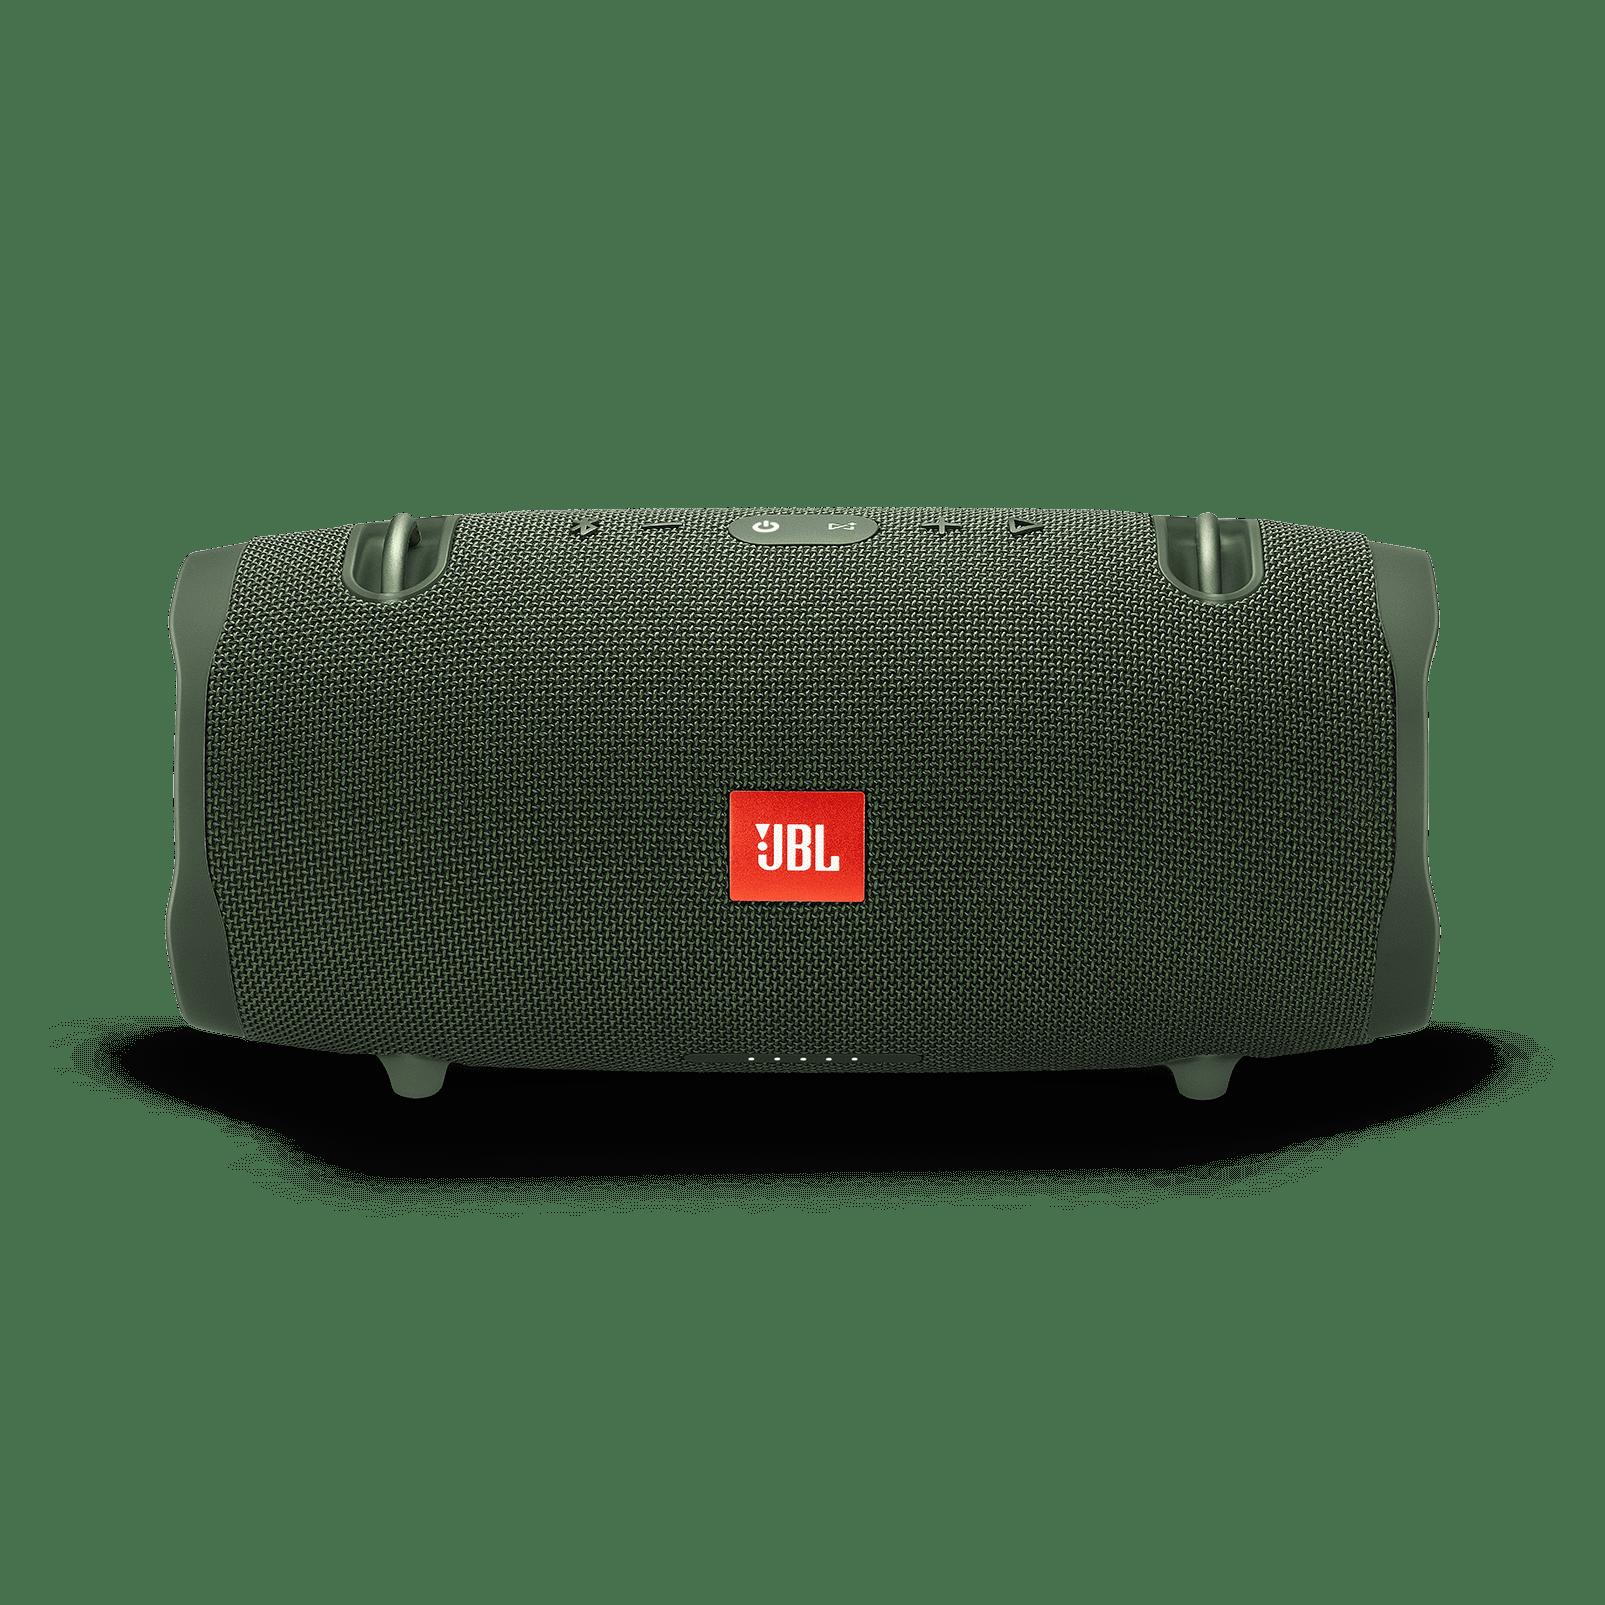 JBL Xtreme 2 Portable Wireless Bluetooth Speakers (Green) by JBL